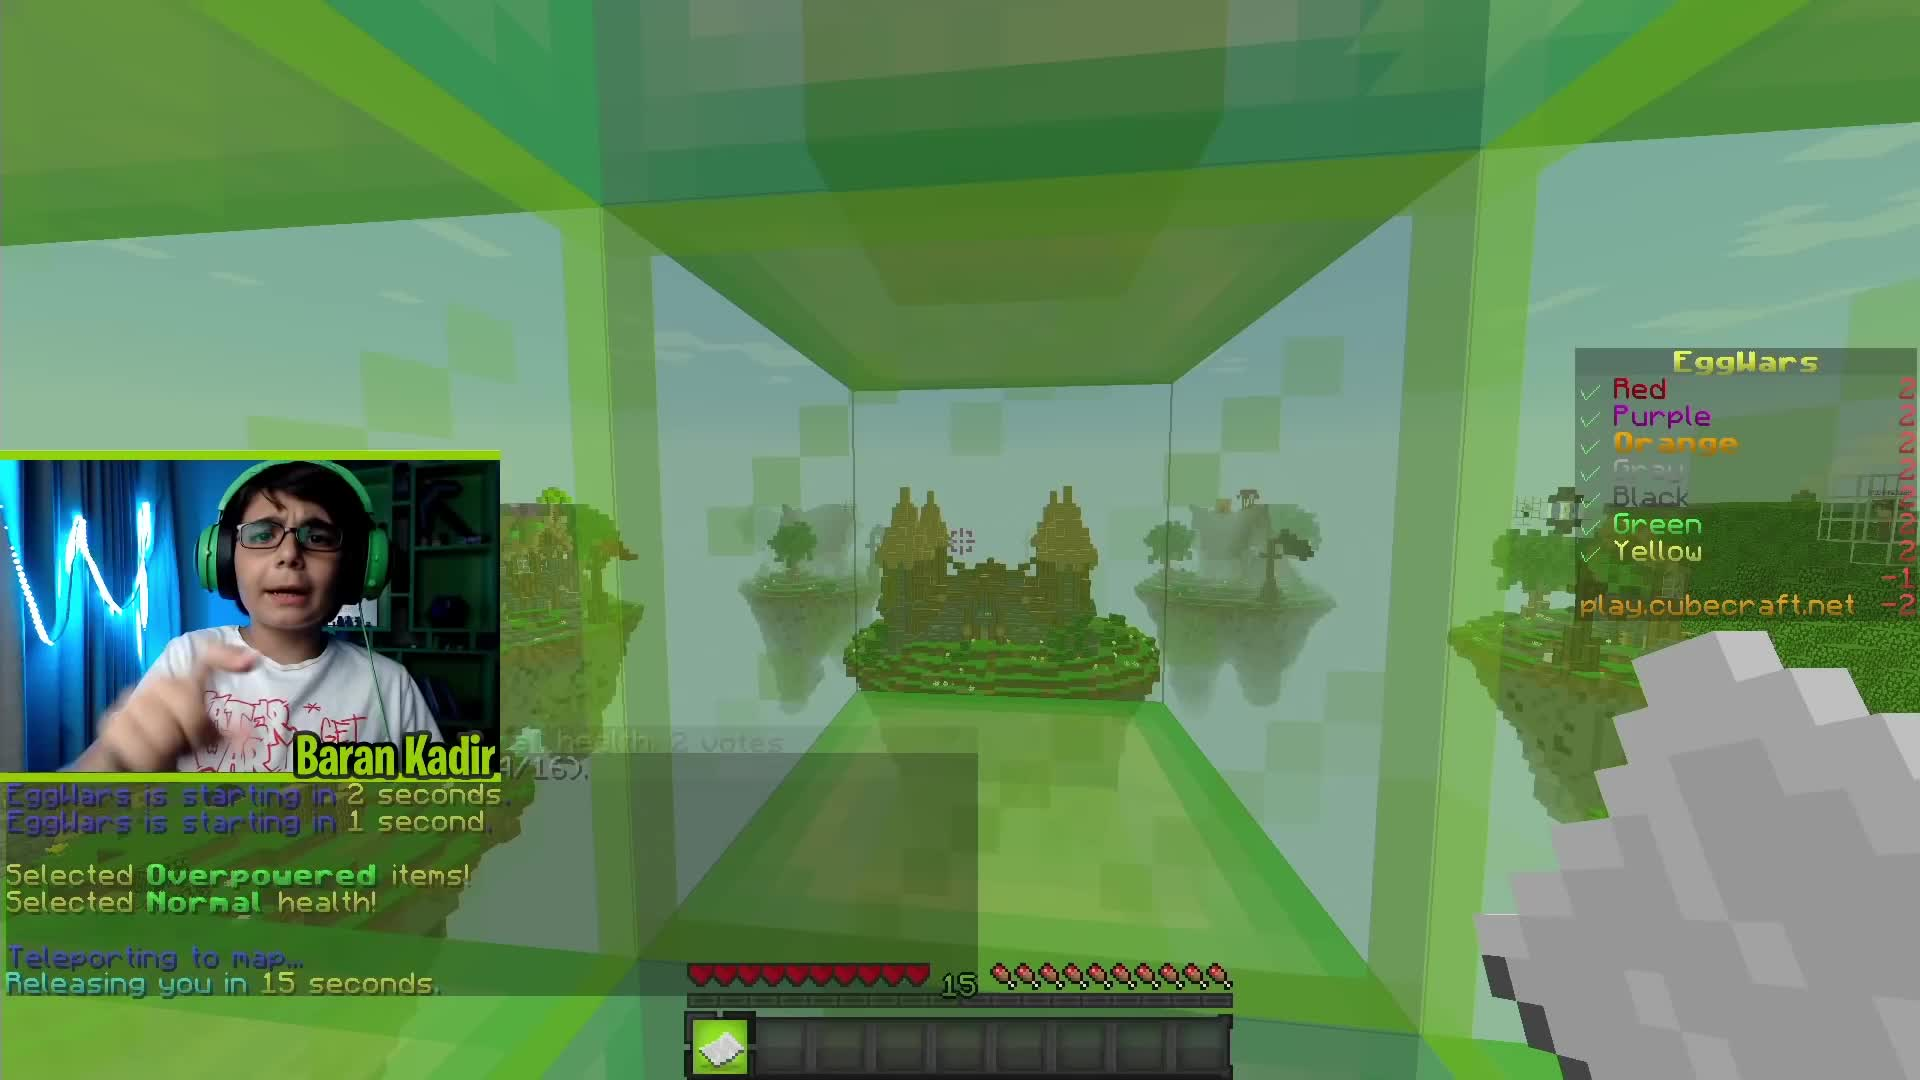 BKT, Baran Kadir Tekin, Egg Wars, GTA 5, Games Time BKT, Hunger Games, Master Builders, Minecraft, Minecraft nasıl yüklenir, Oyunları, Speed Builders, burak oyunda, counter strike, csgo, enes batur, garbarius, genç hane, minecraft evi, minecraft server, orkun ışıtmak, HİLECİLERLE SAVAŞ (Türkçe Minecraft) BKT GIFs